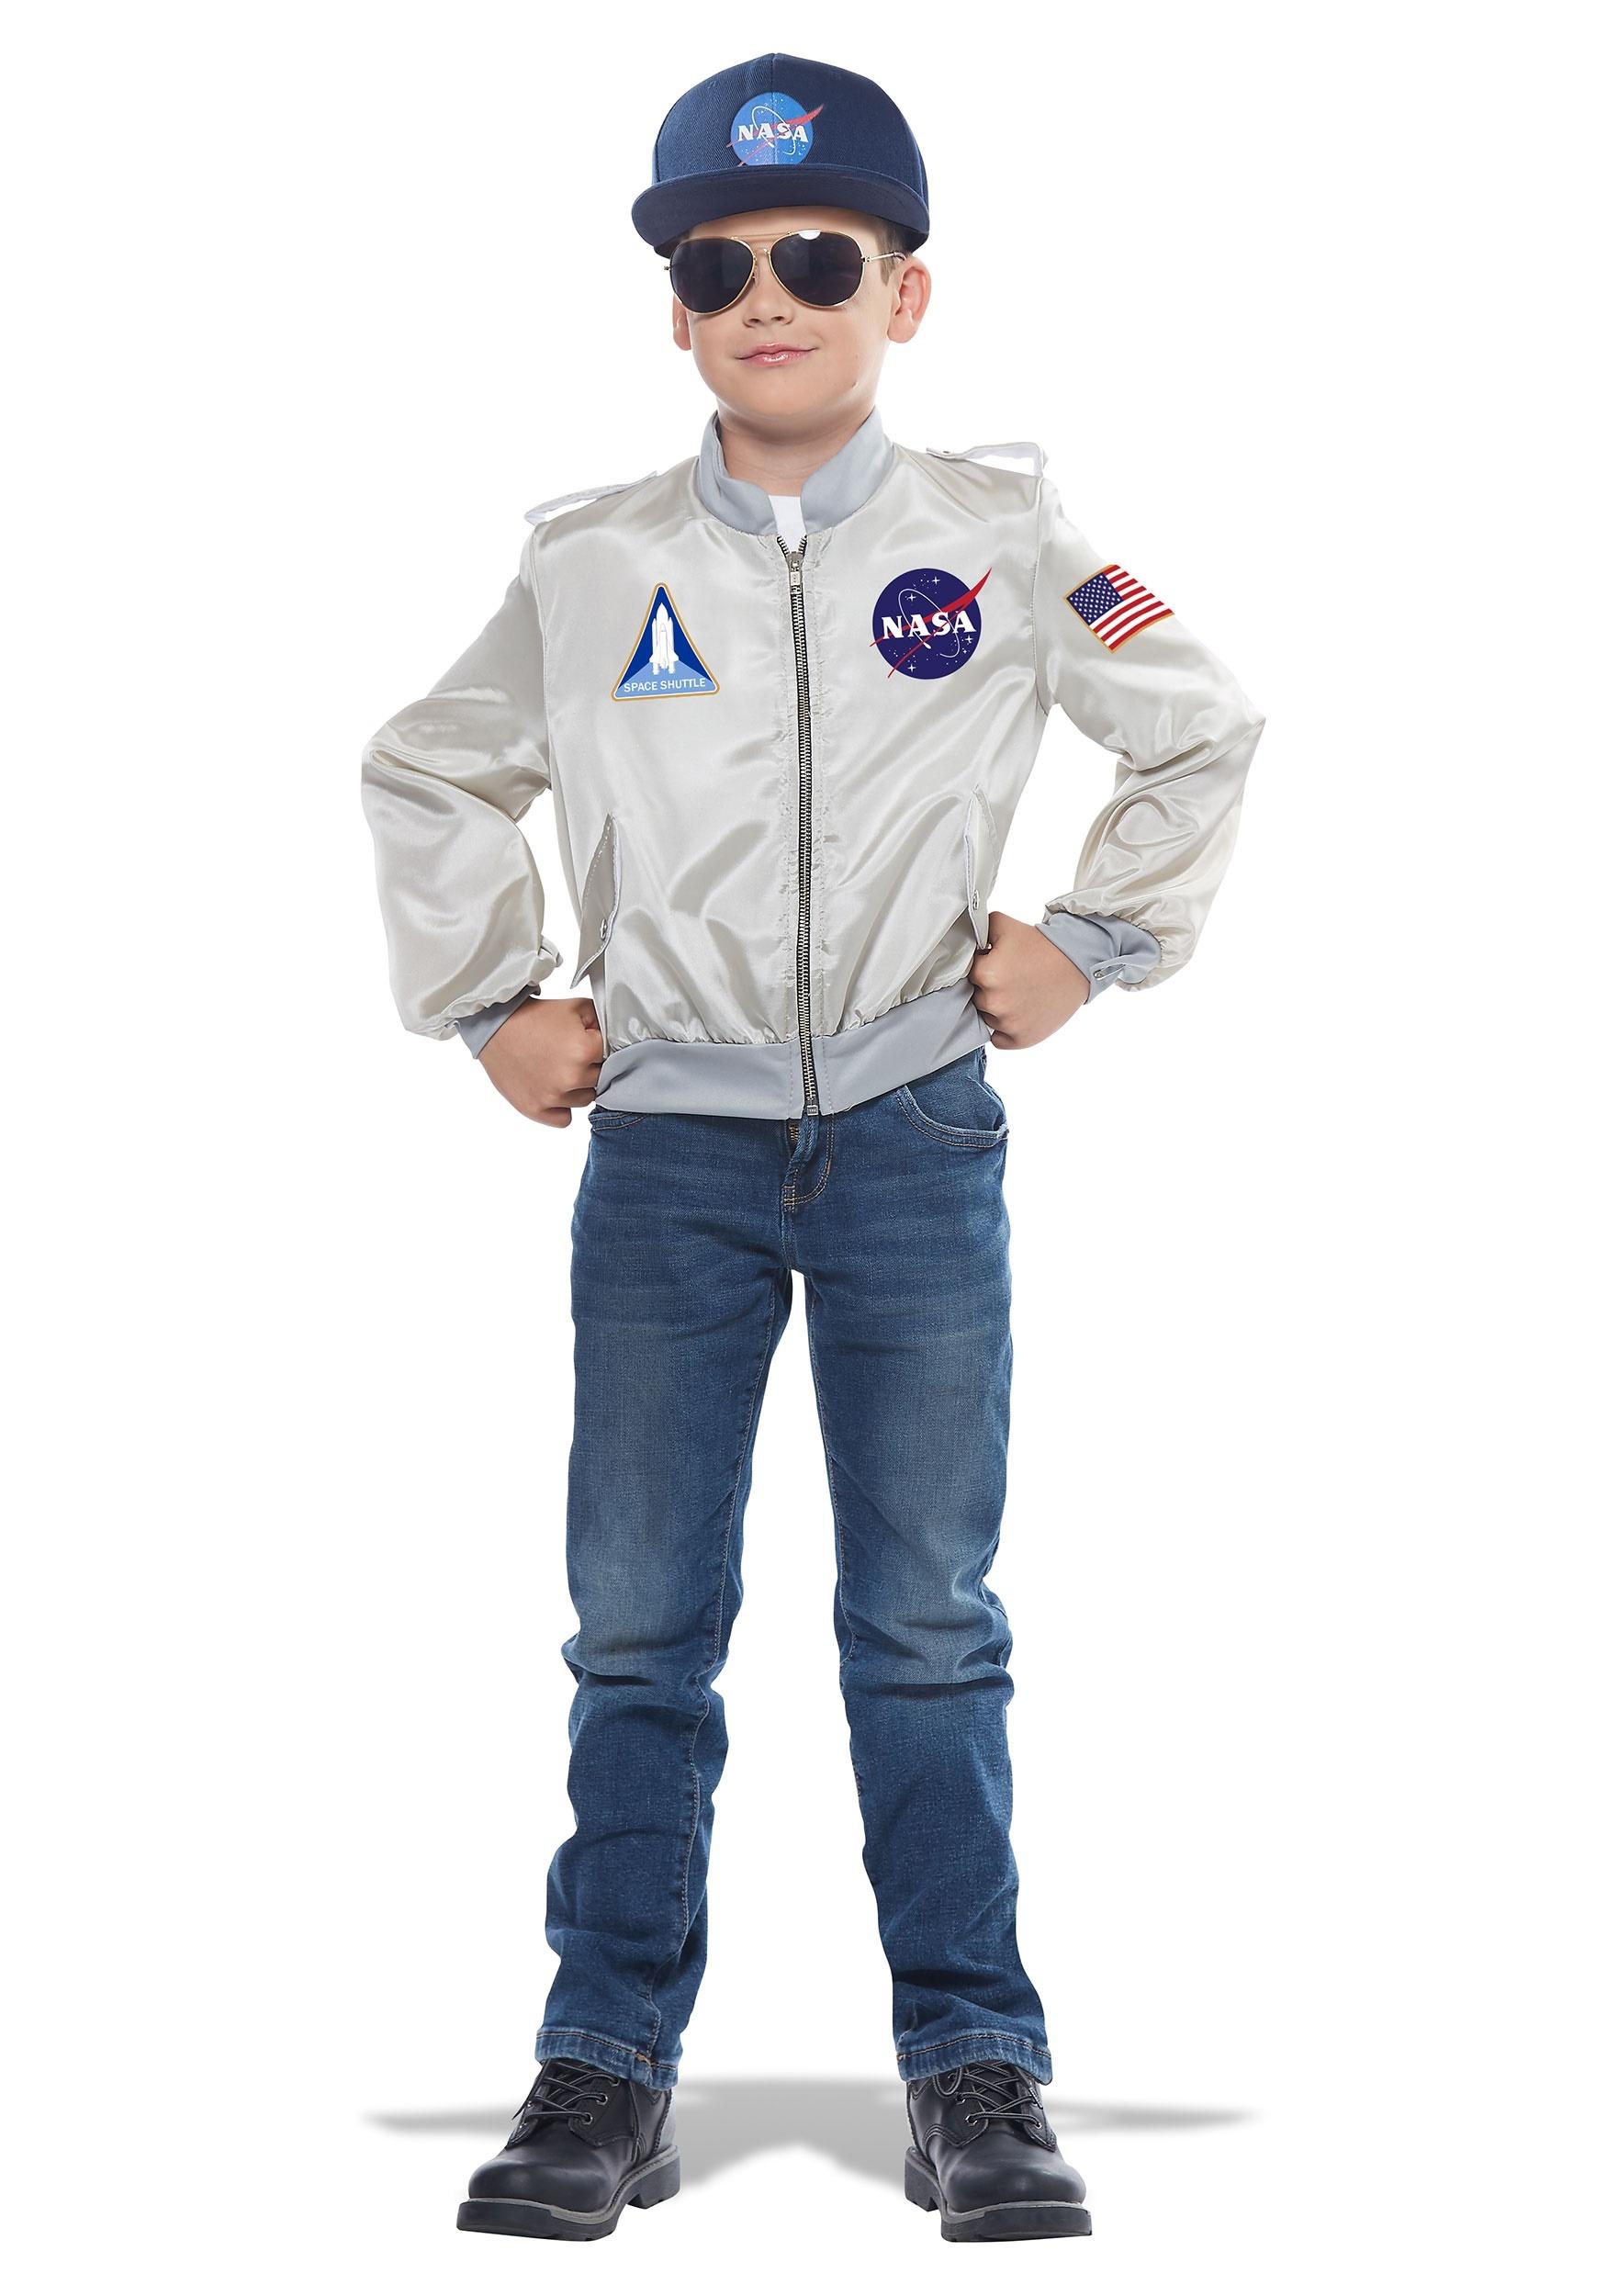 NASA Flight Jacket Costume for Kids